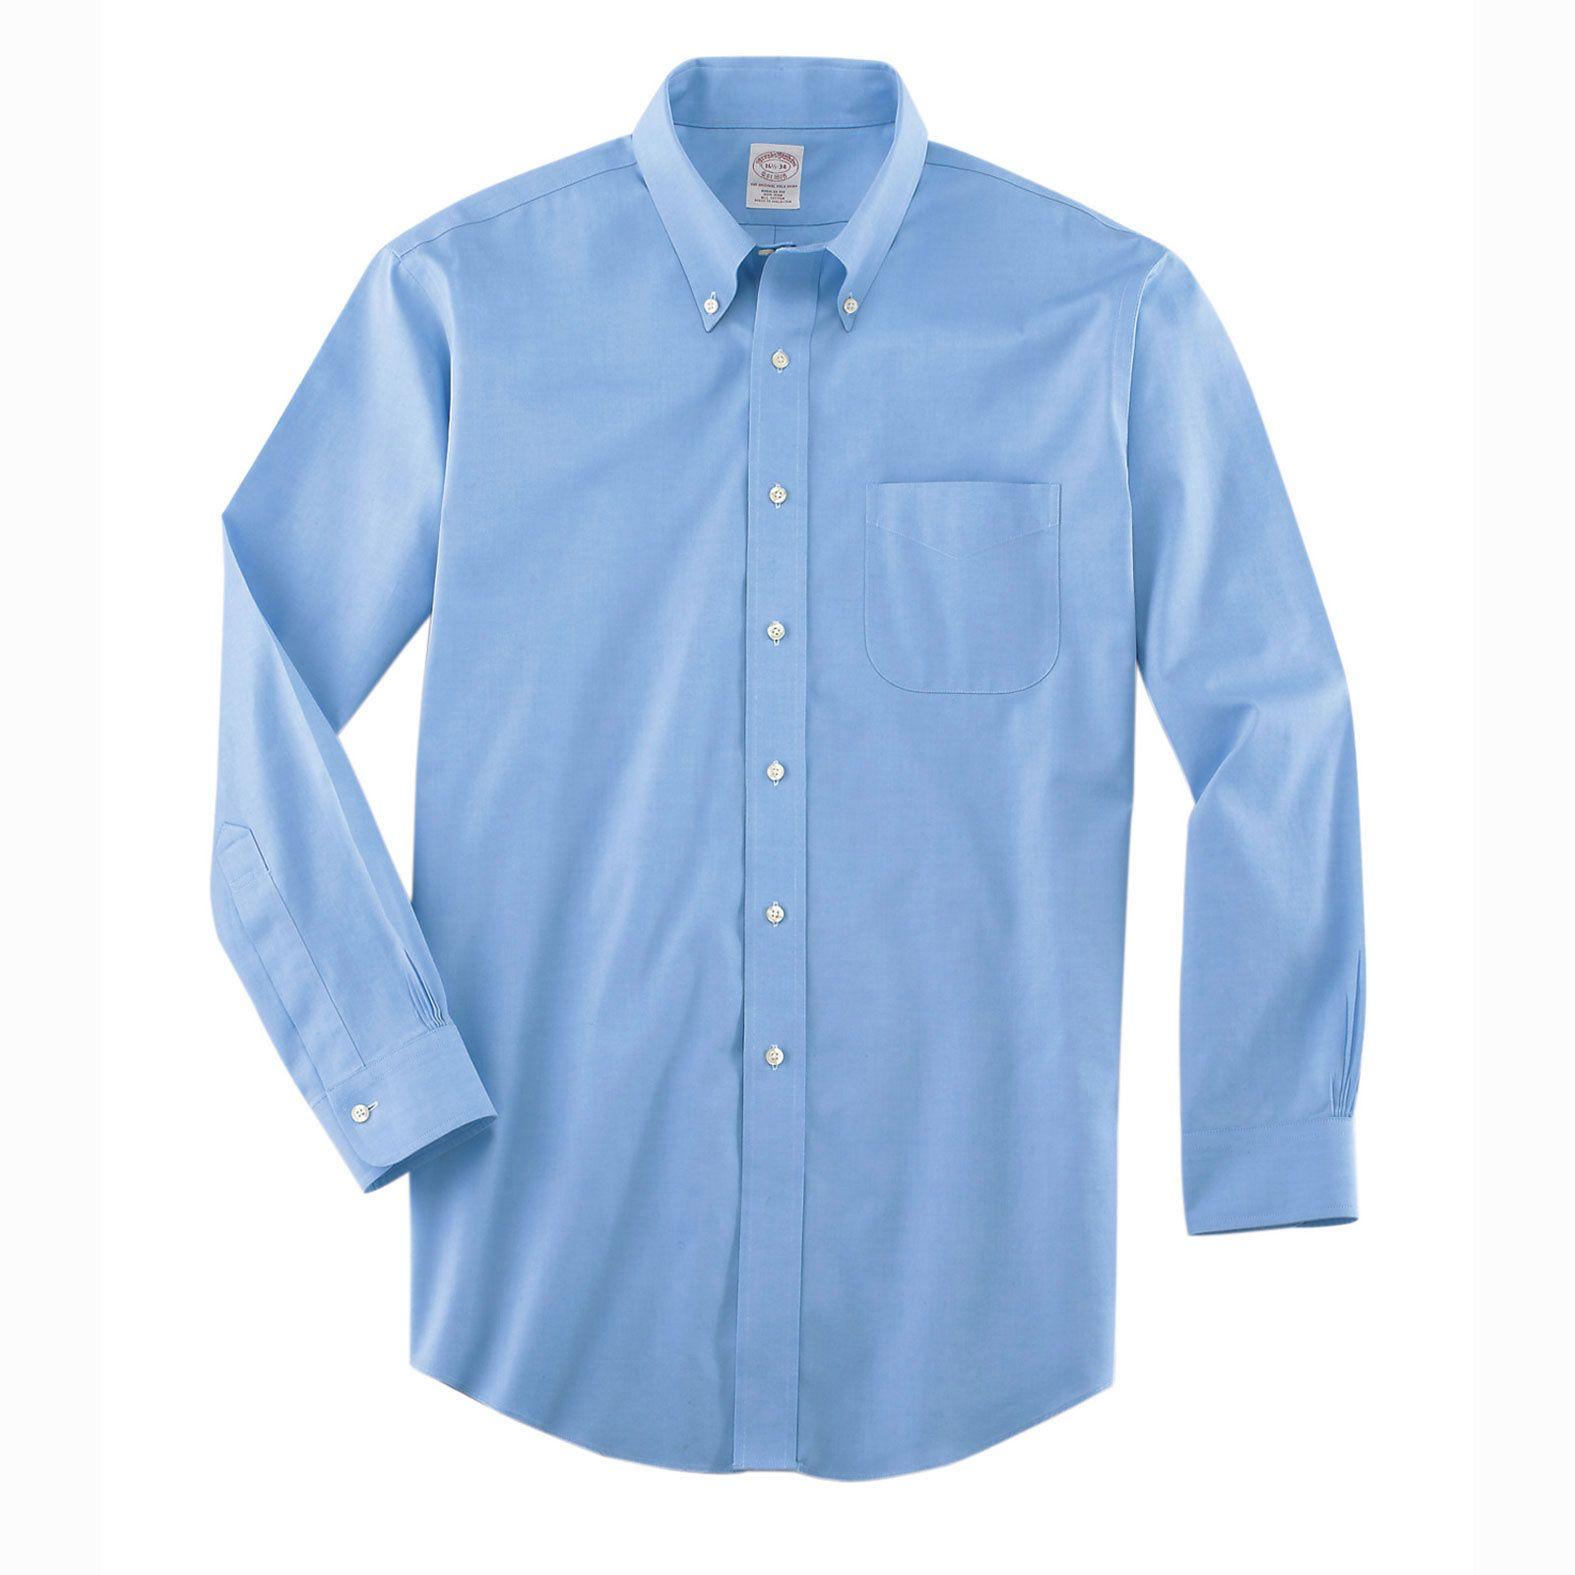 Blue Dress Shirt Clip Art Festive inspirations for the new Sleekster  collection